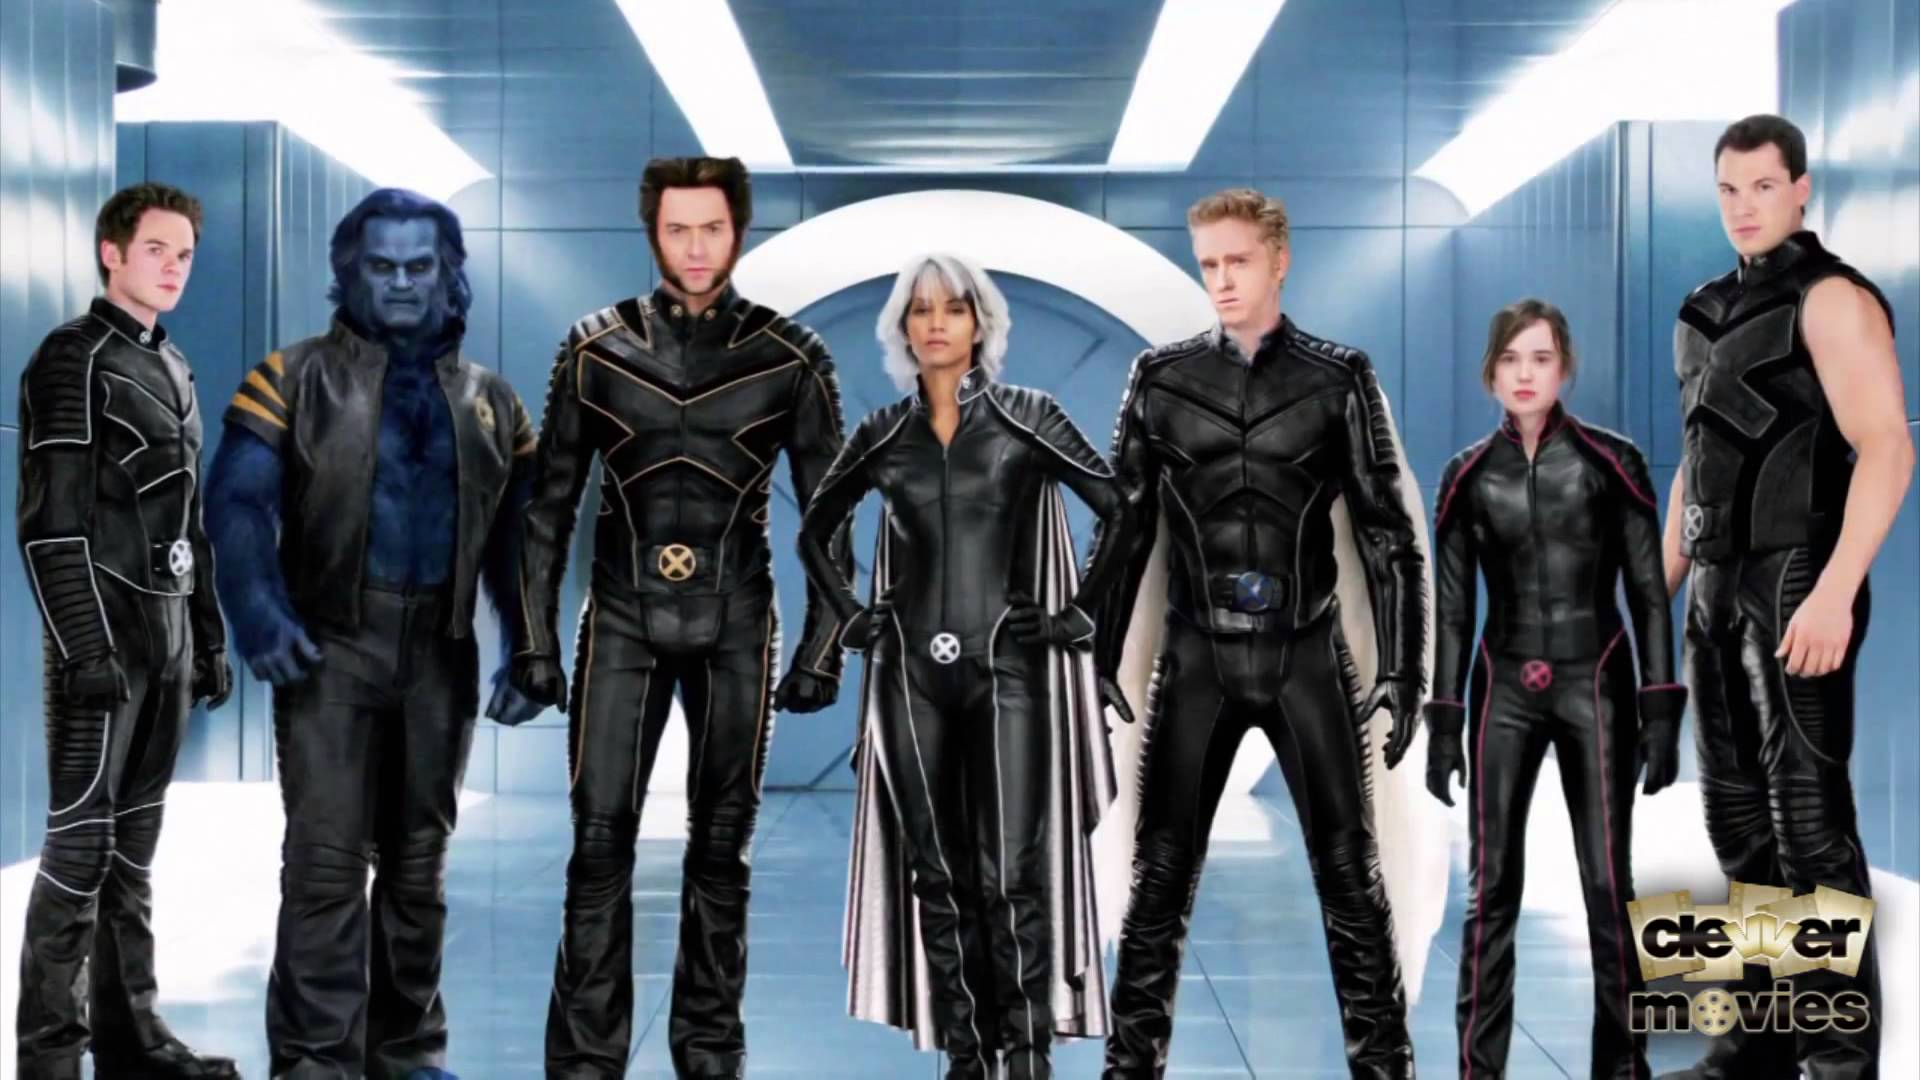 Watch X-Men First Class 2 - Days Of Future Past - July 8Th, 2014 - X Men Days Of Future Past Review